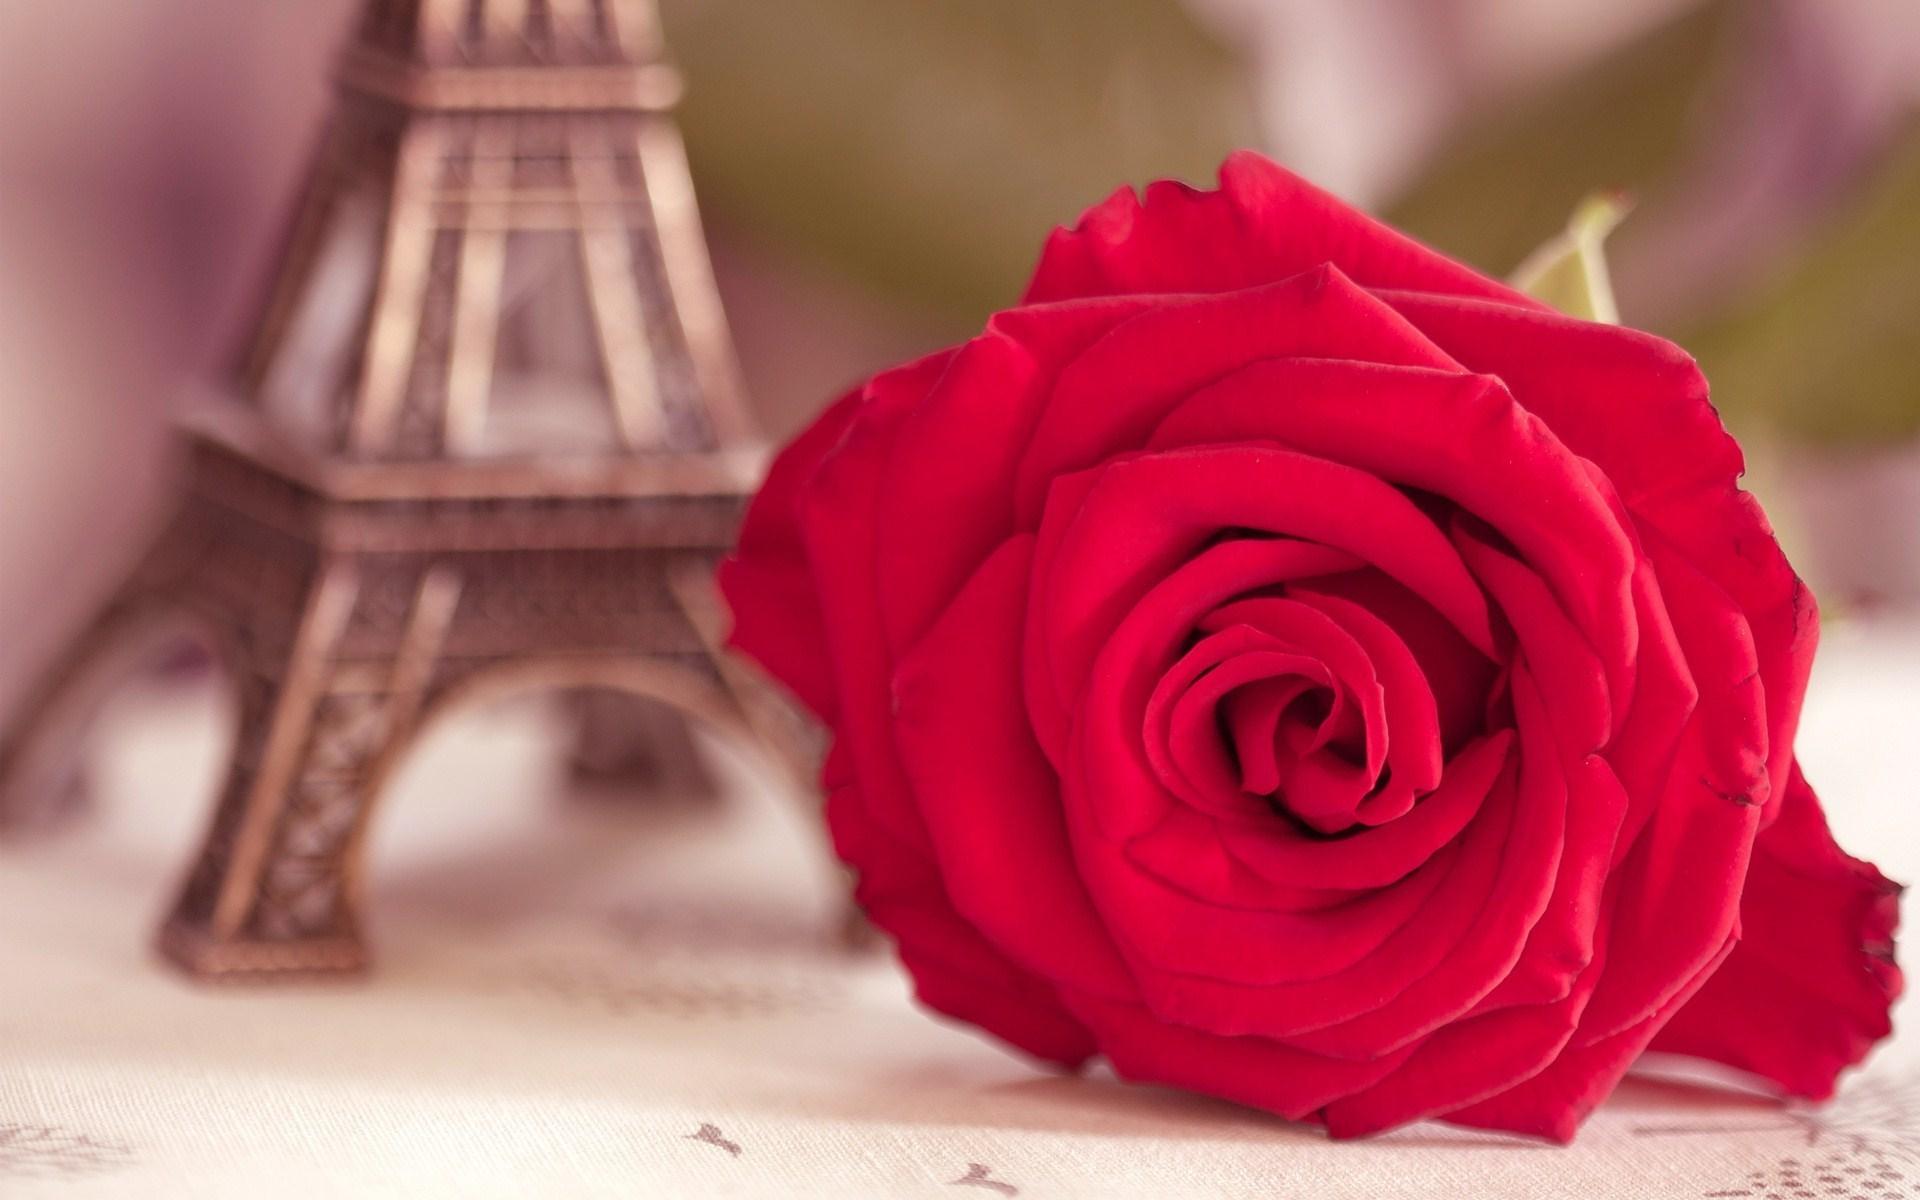 cute roses wallpaper hd desktop wallpapers 4k hd